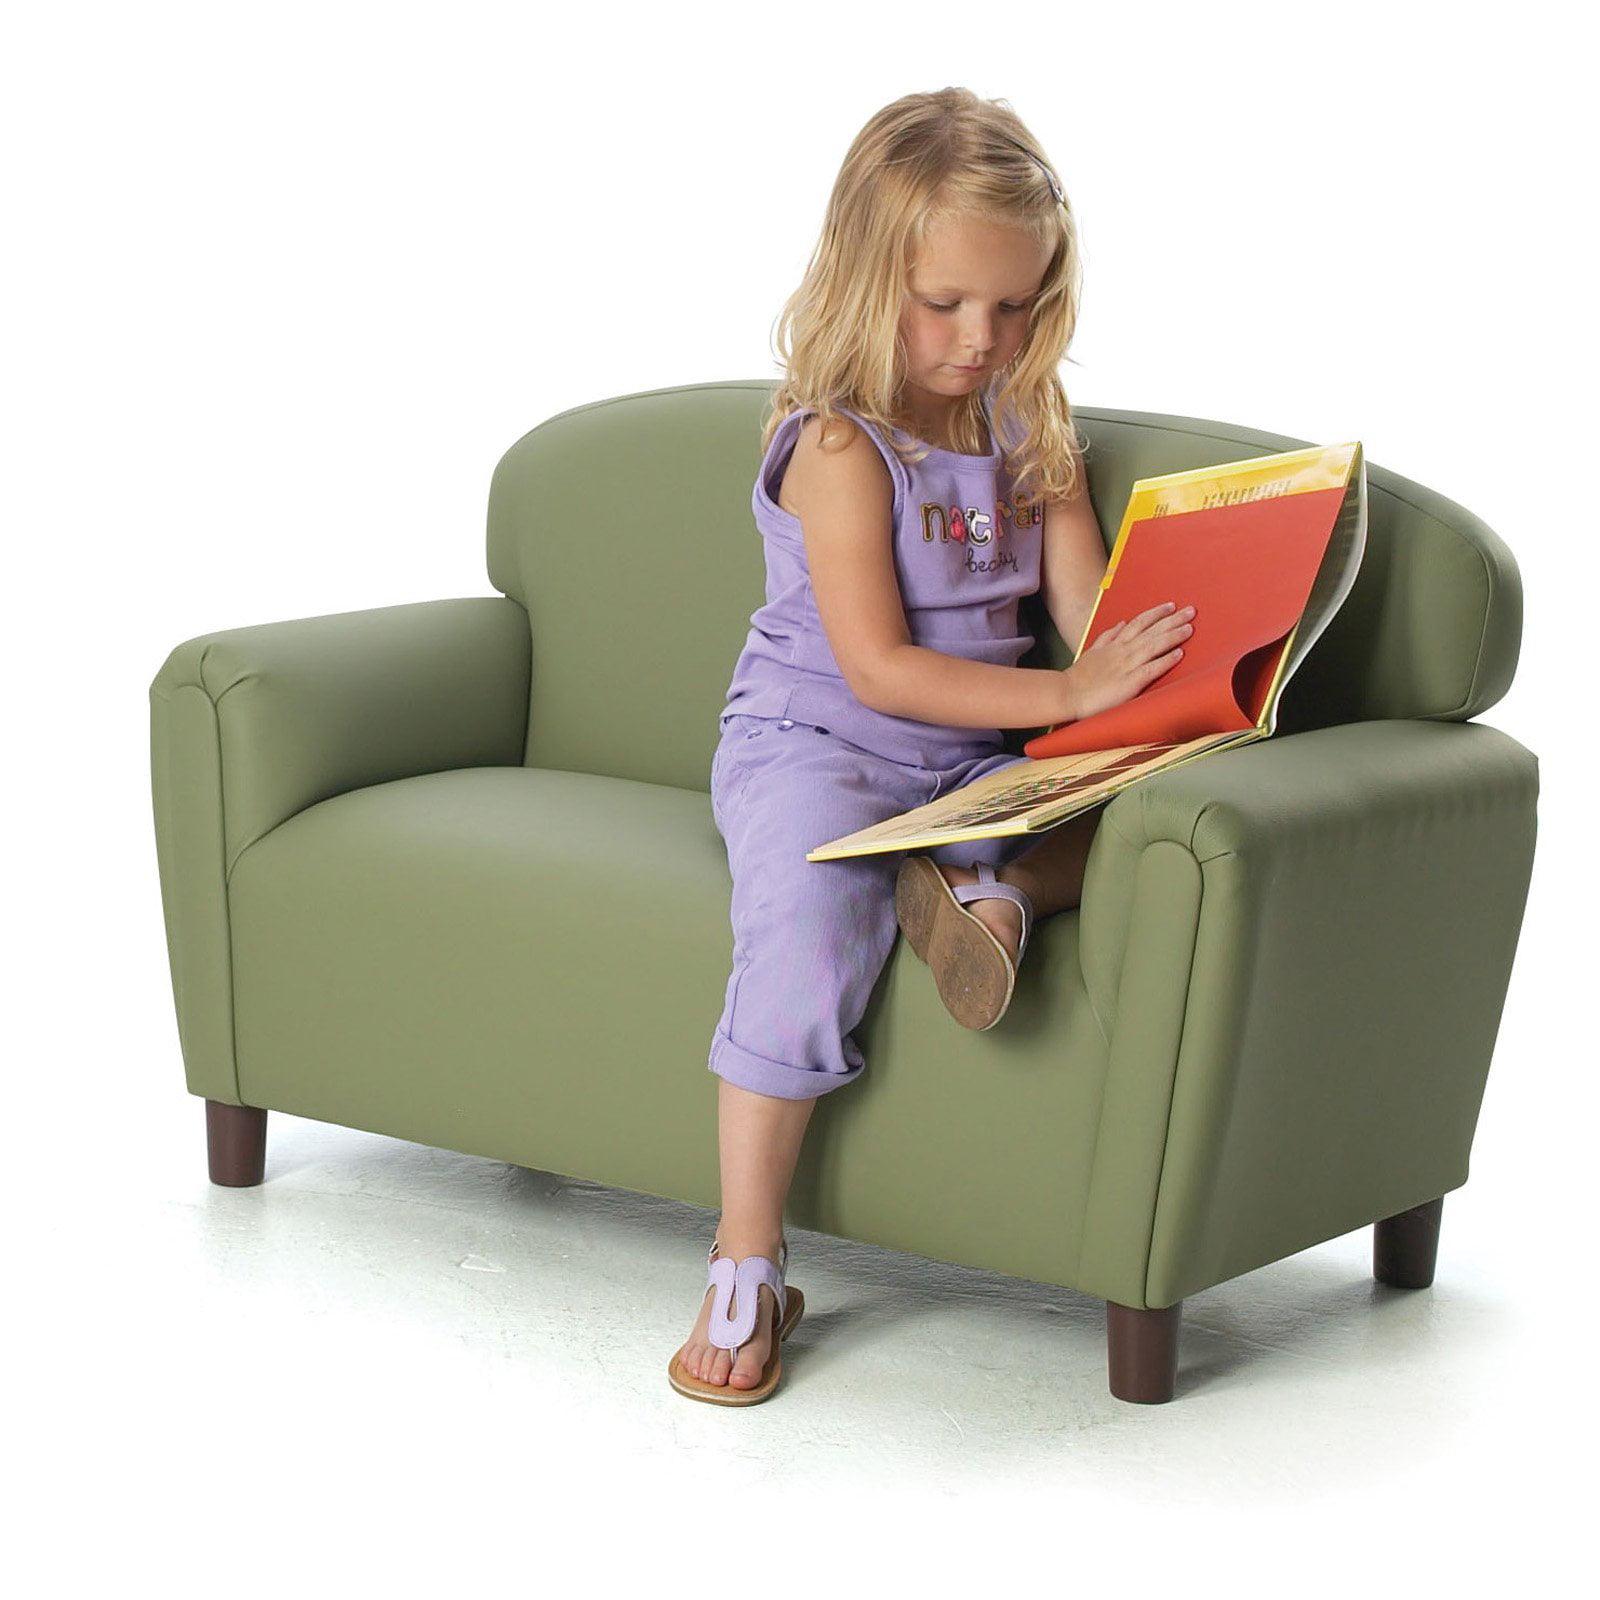 Brand New World Enviro-Child Upholstered Preschool Sofa by BNW